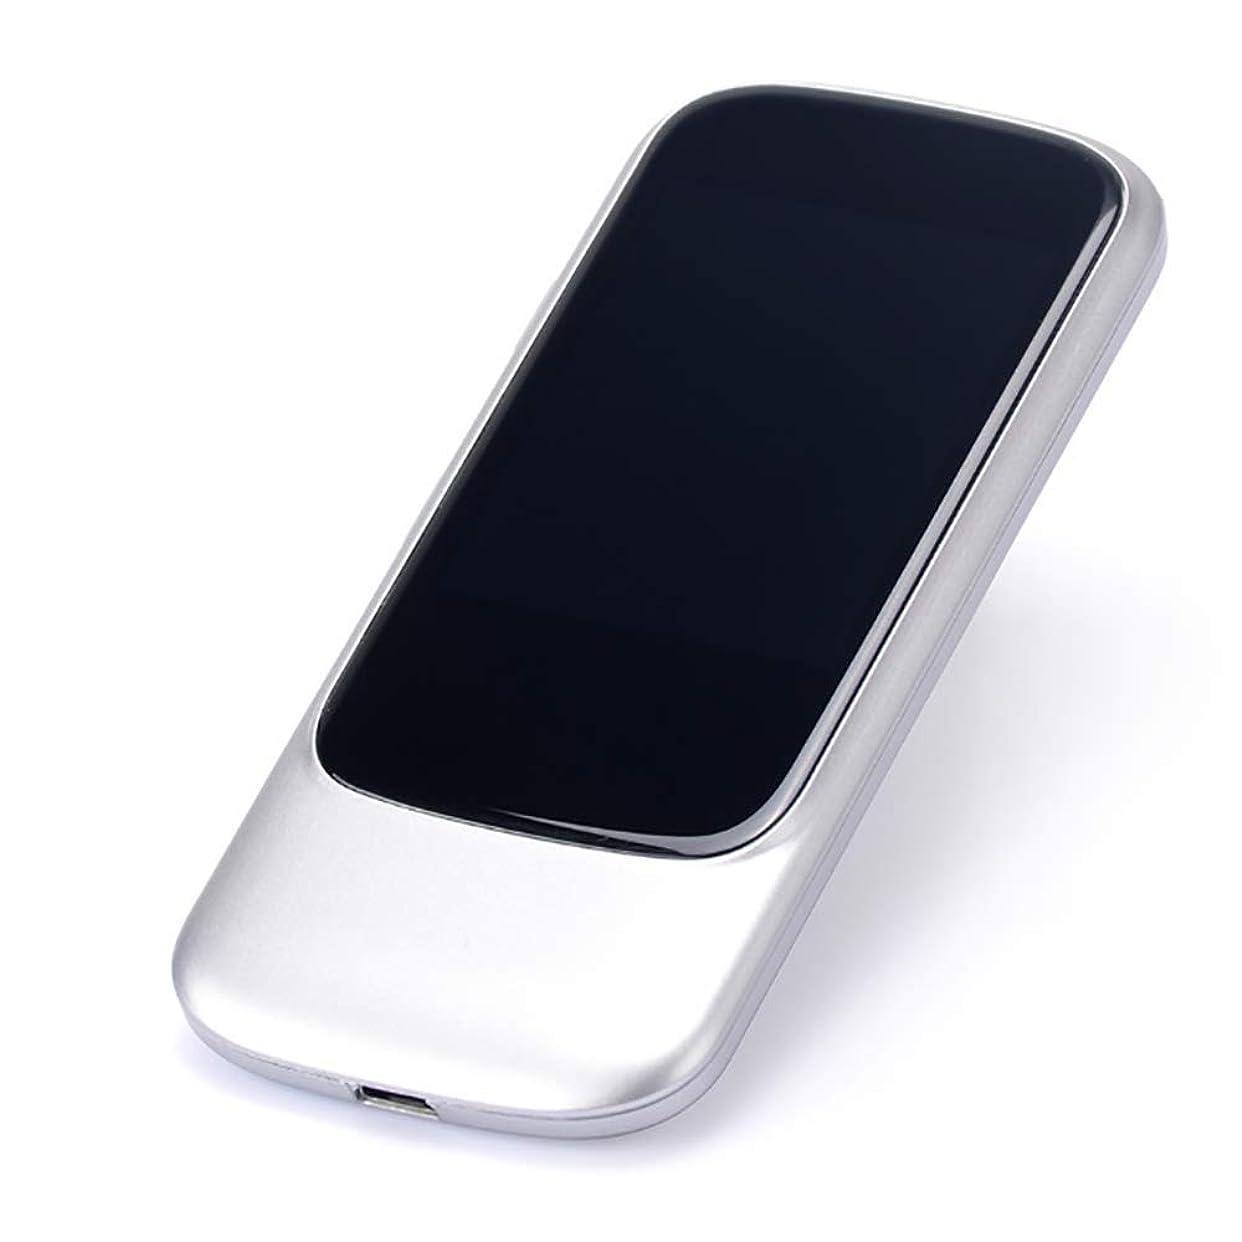 FUTN Portable Smart Language Translator Device, Handheld